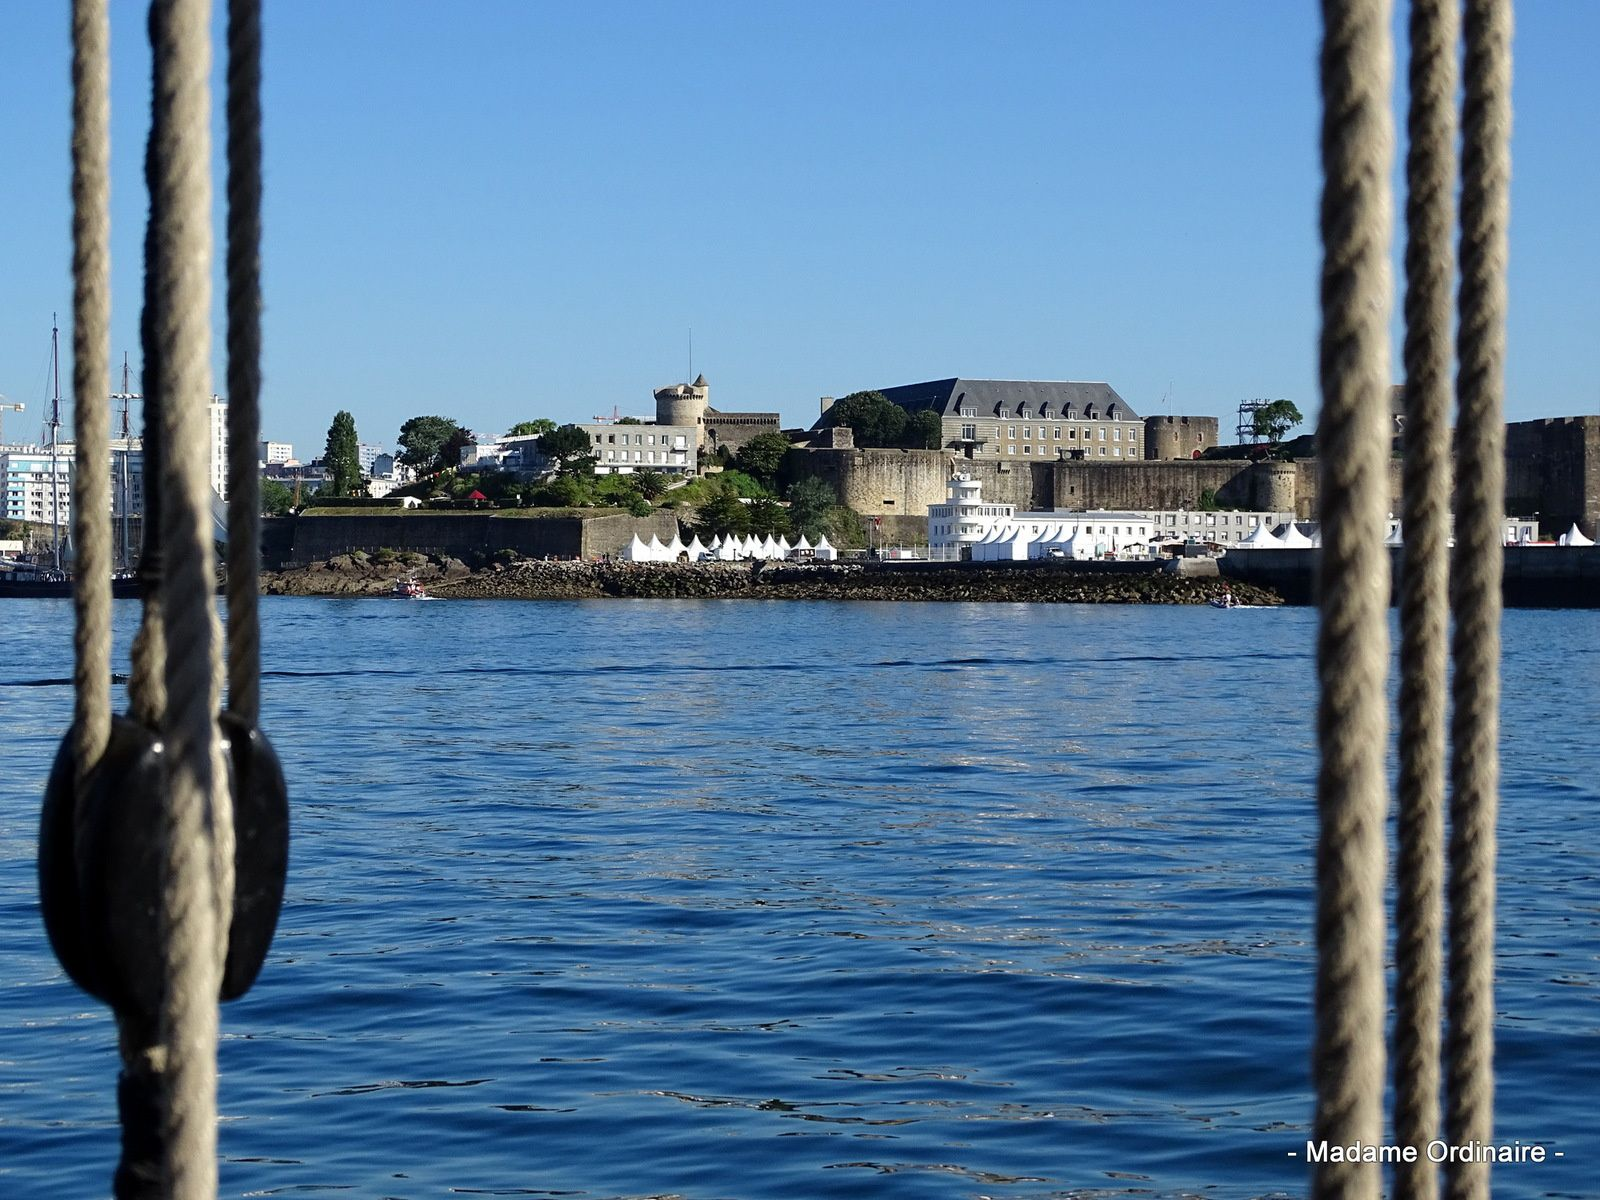 Brest 2016 à bord du Renard